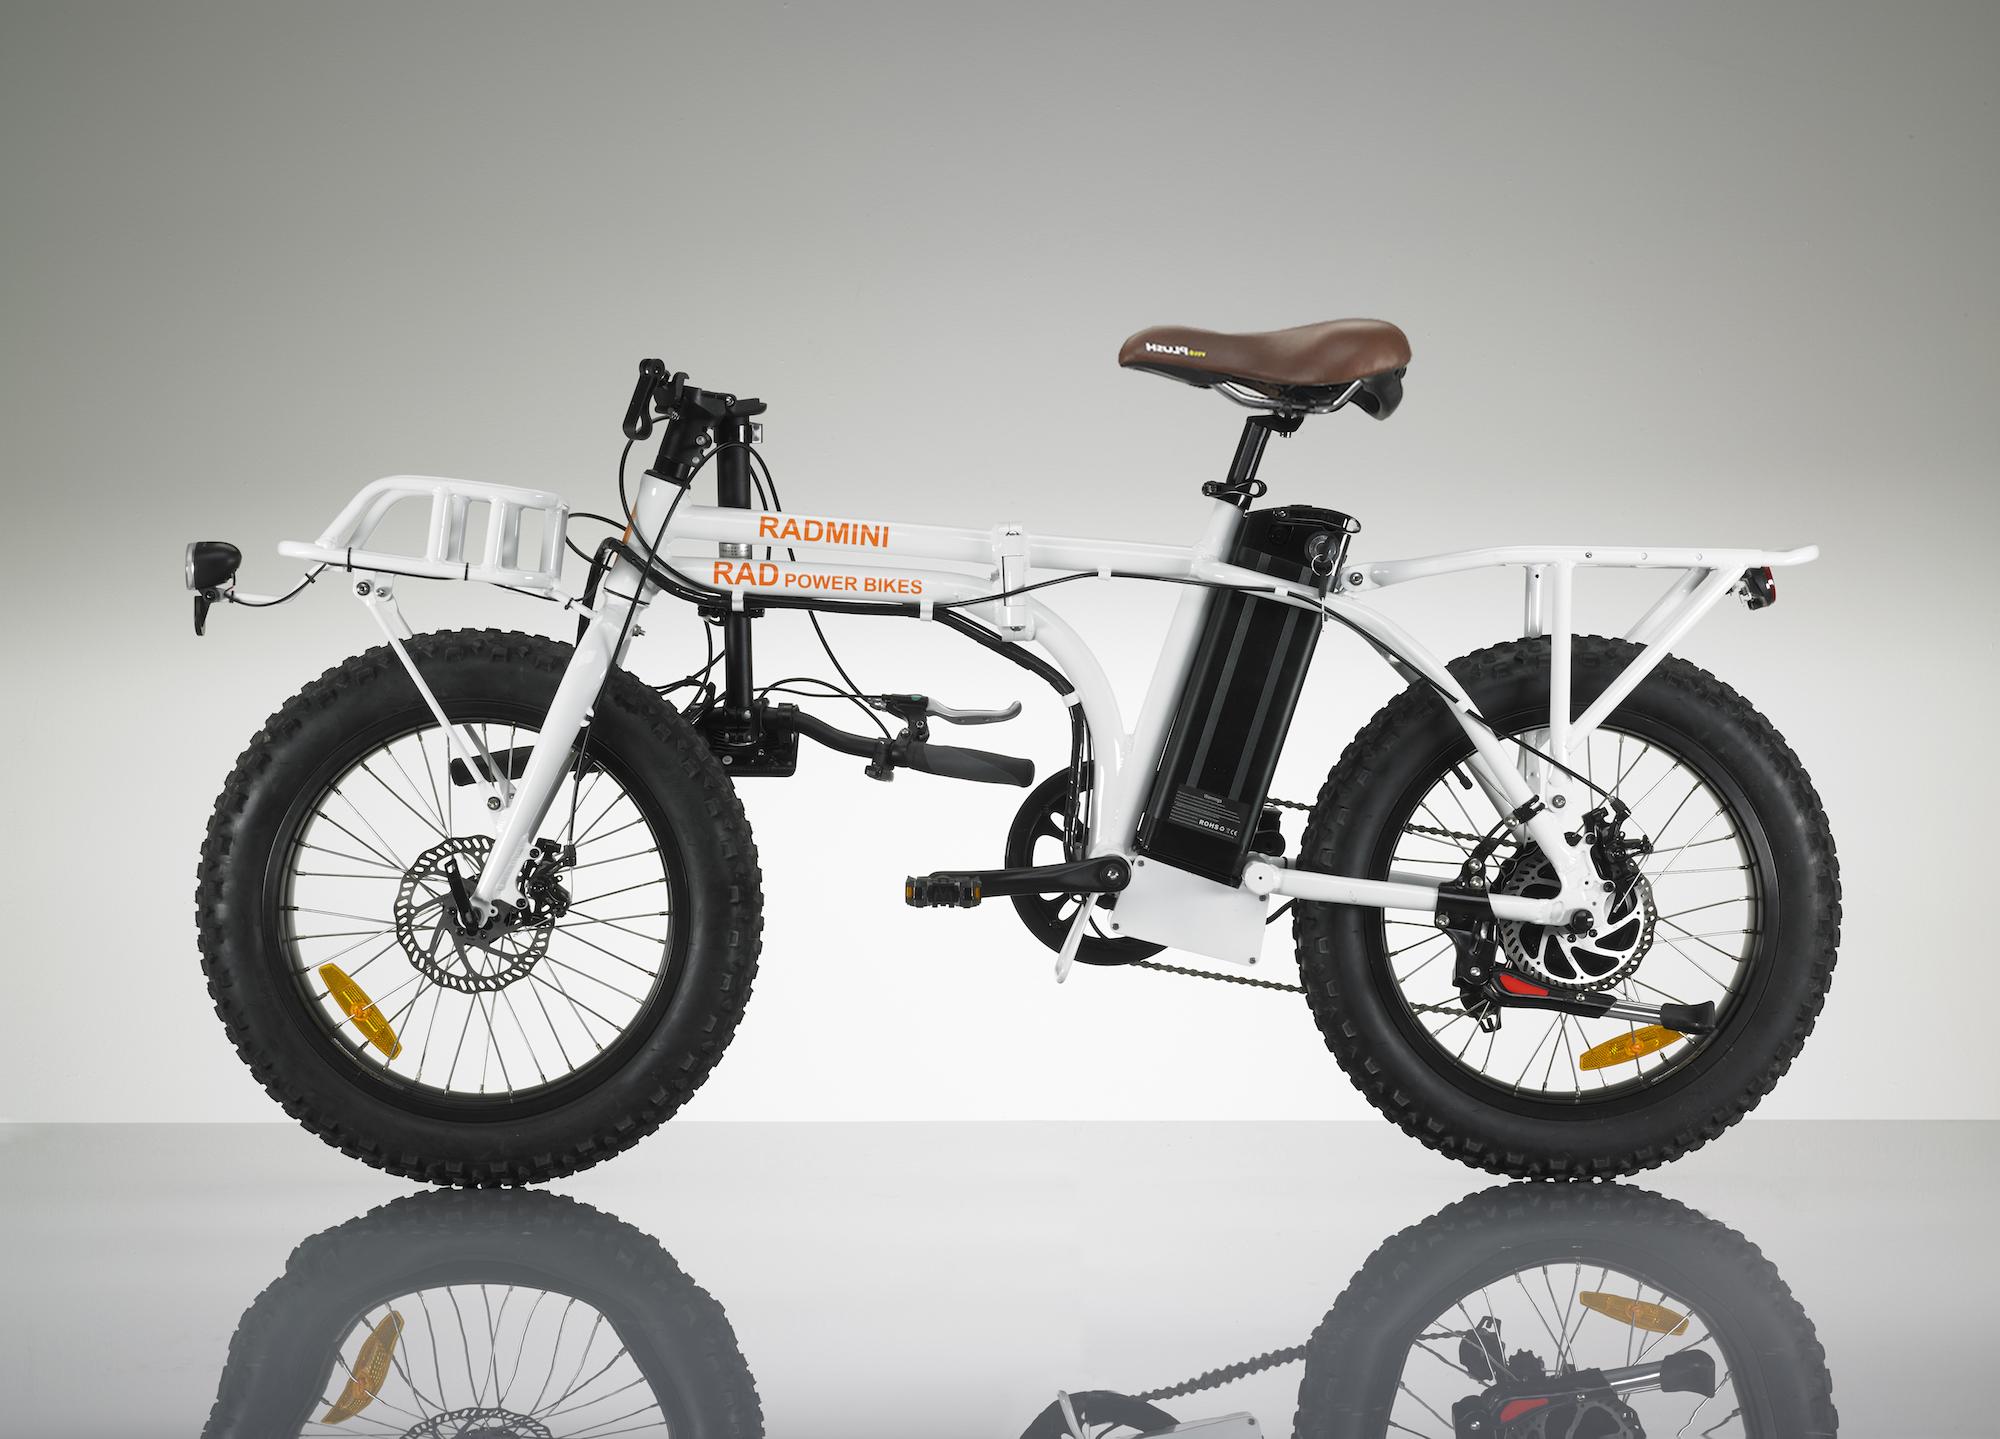 Radmini Electric Folding Fat Bike Rad Power Bikes 6